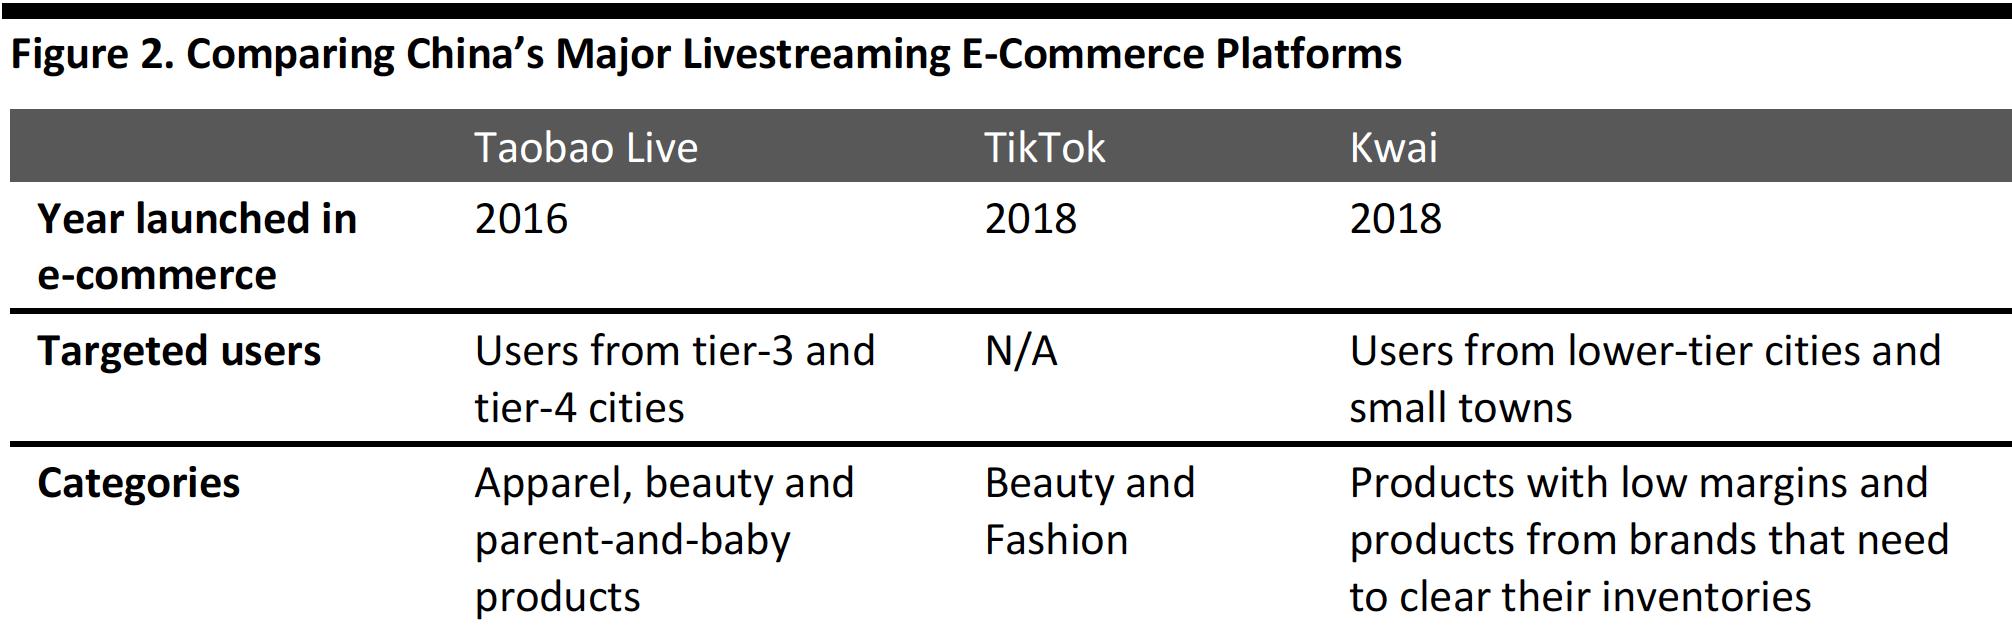 Figure 2. Comparing China's Major Livestreaming E-Commerce Platforms